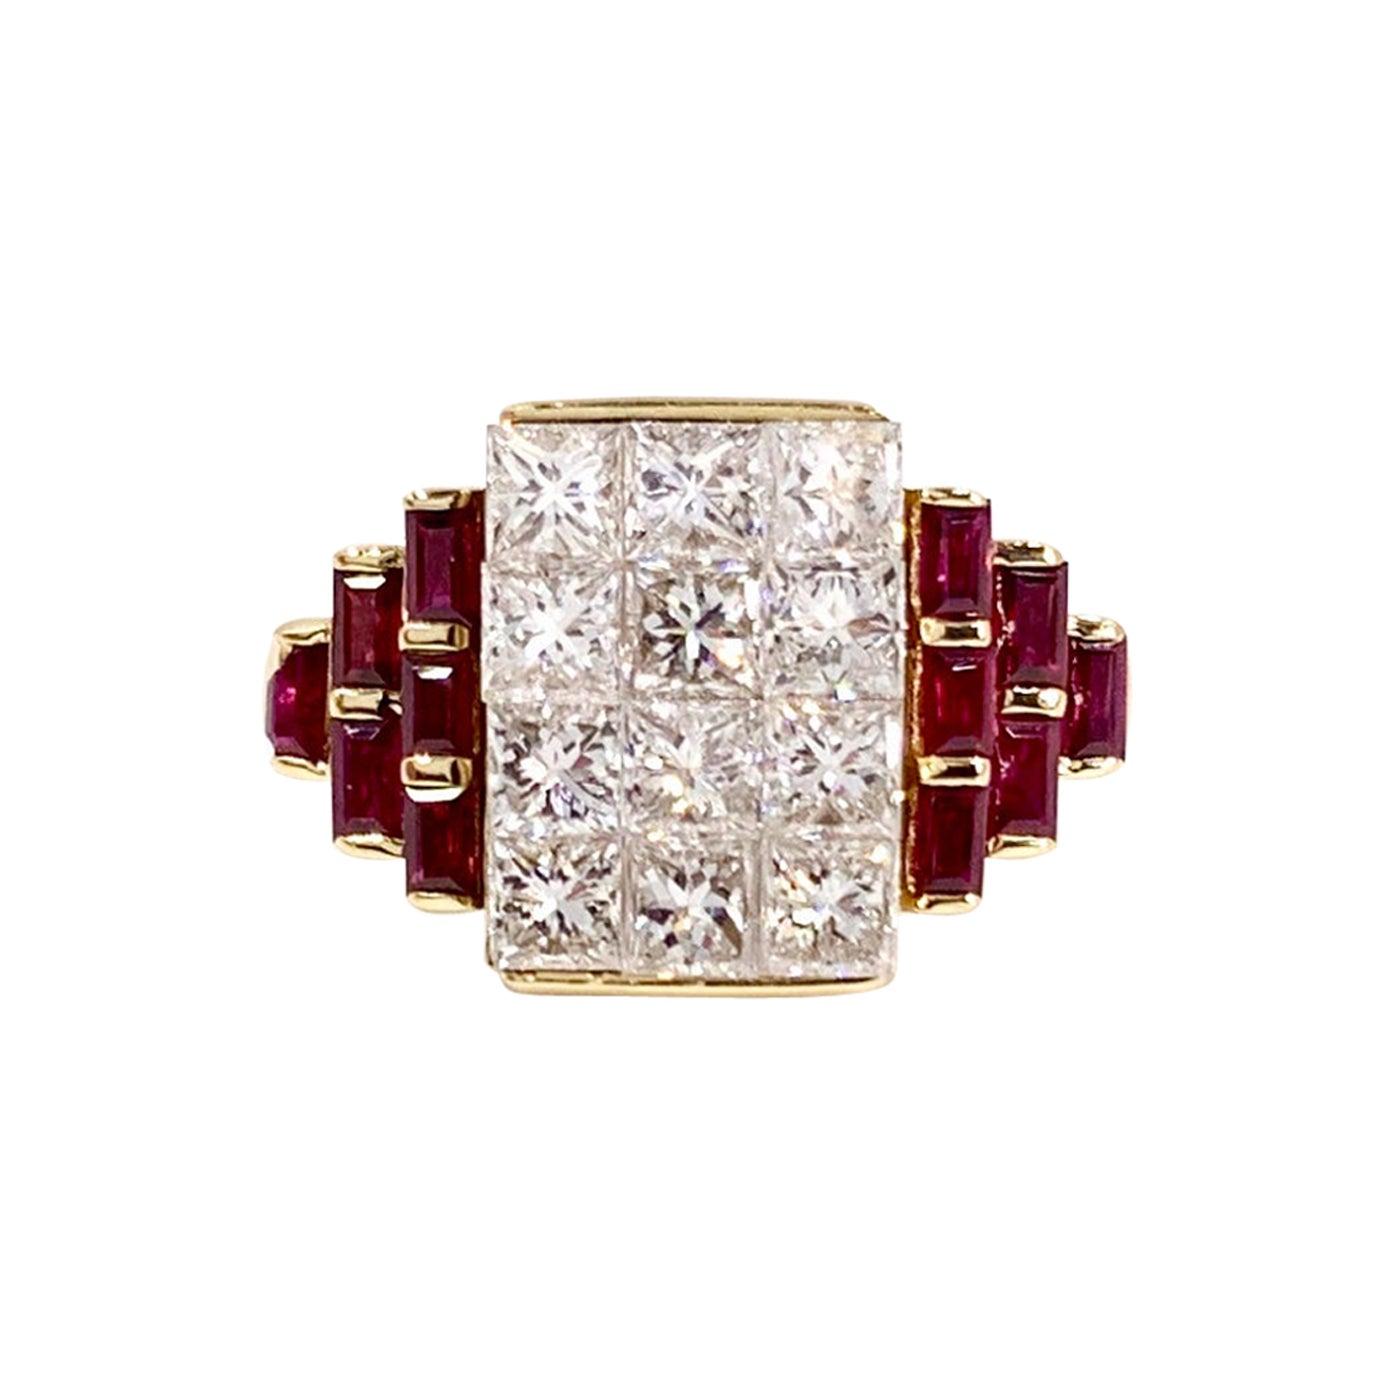 18 Karat Diamond and Ruby Cocktail Ring